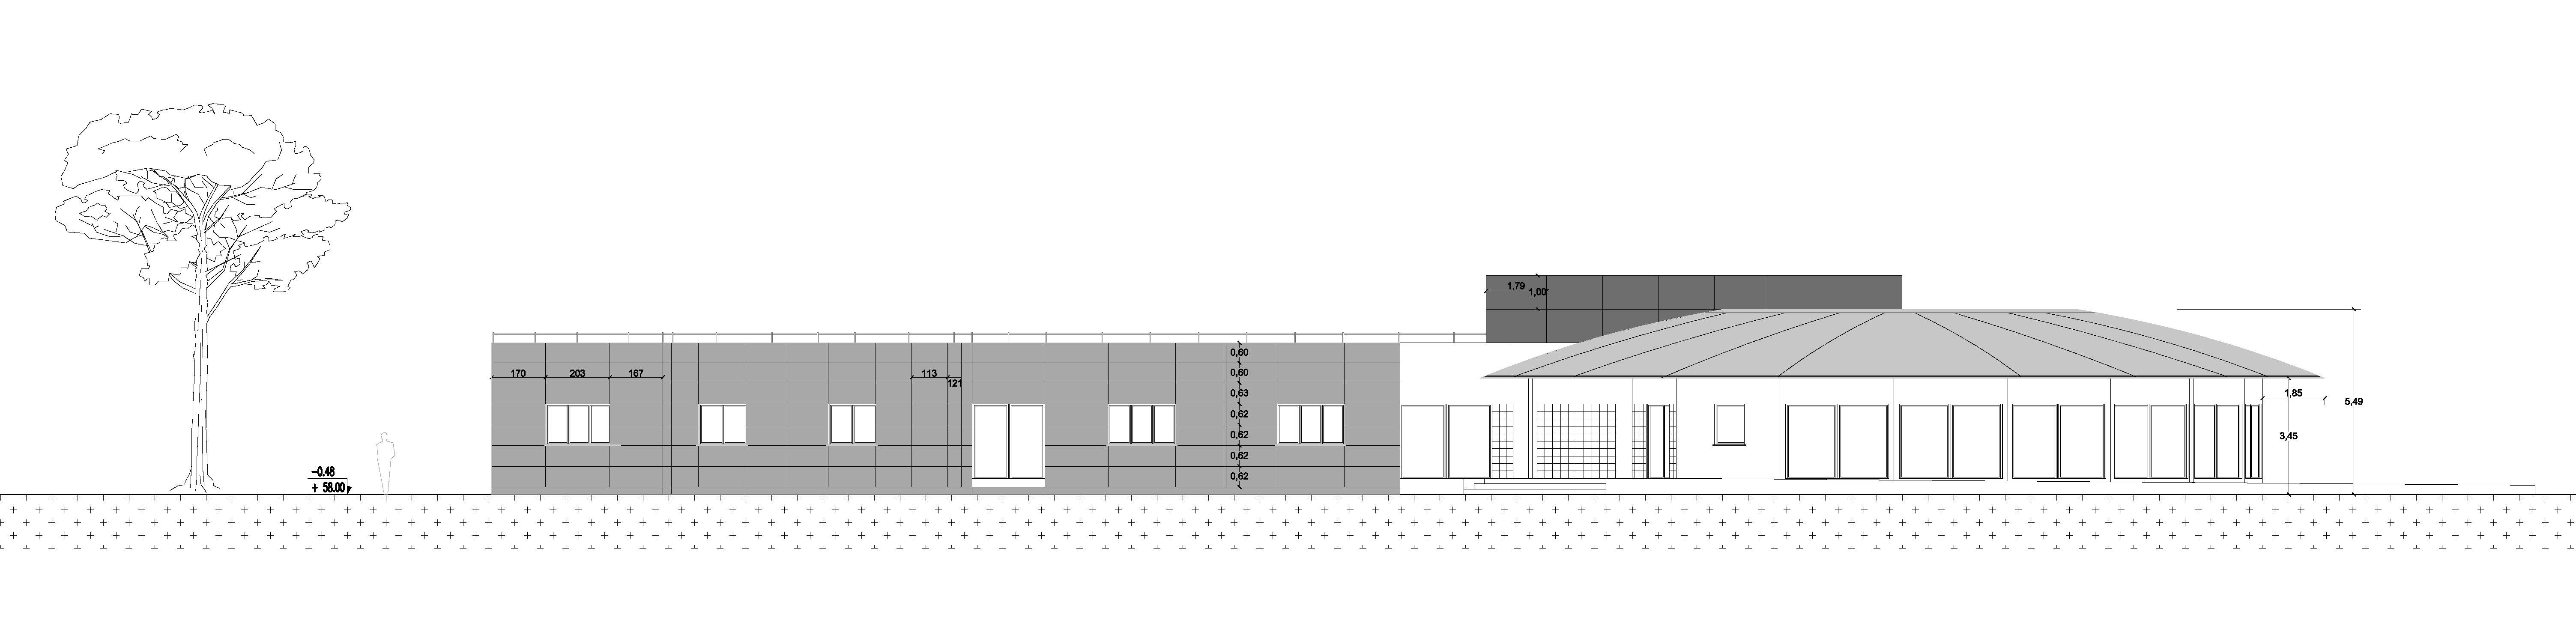 111130-façades.jpg